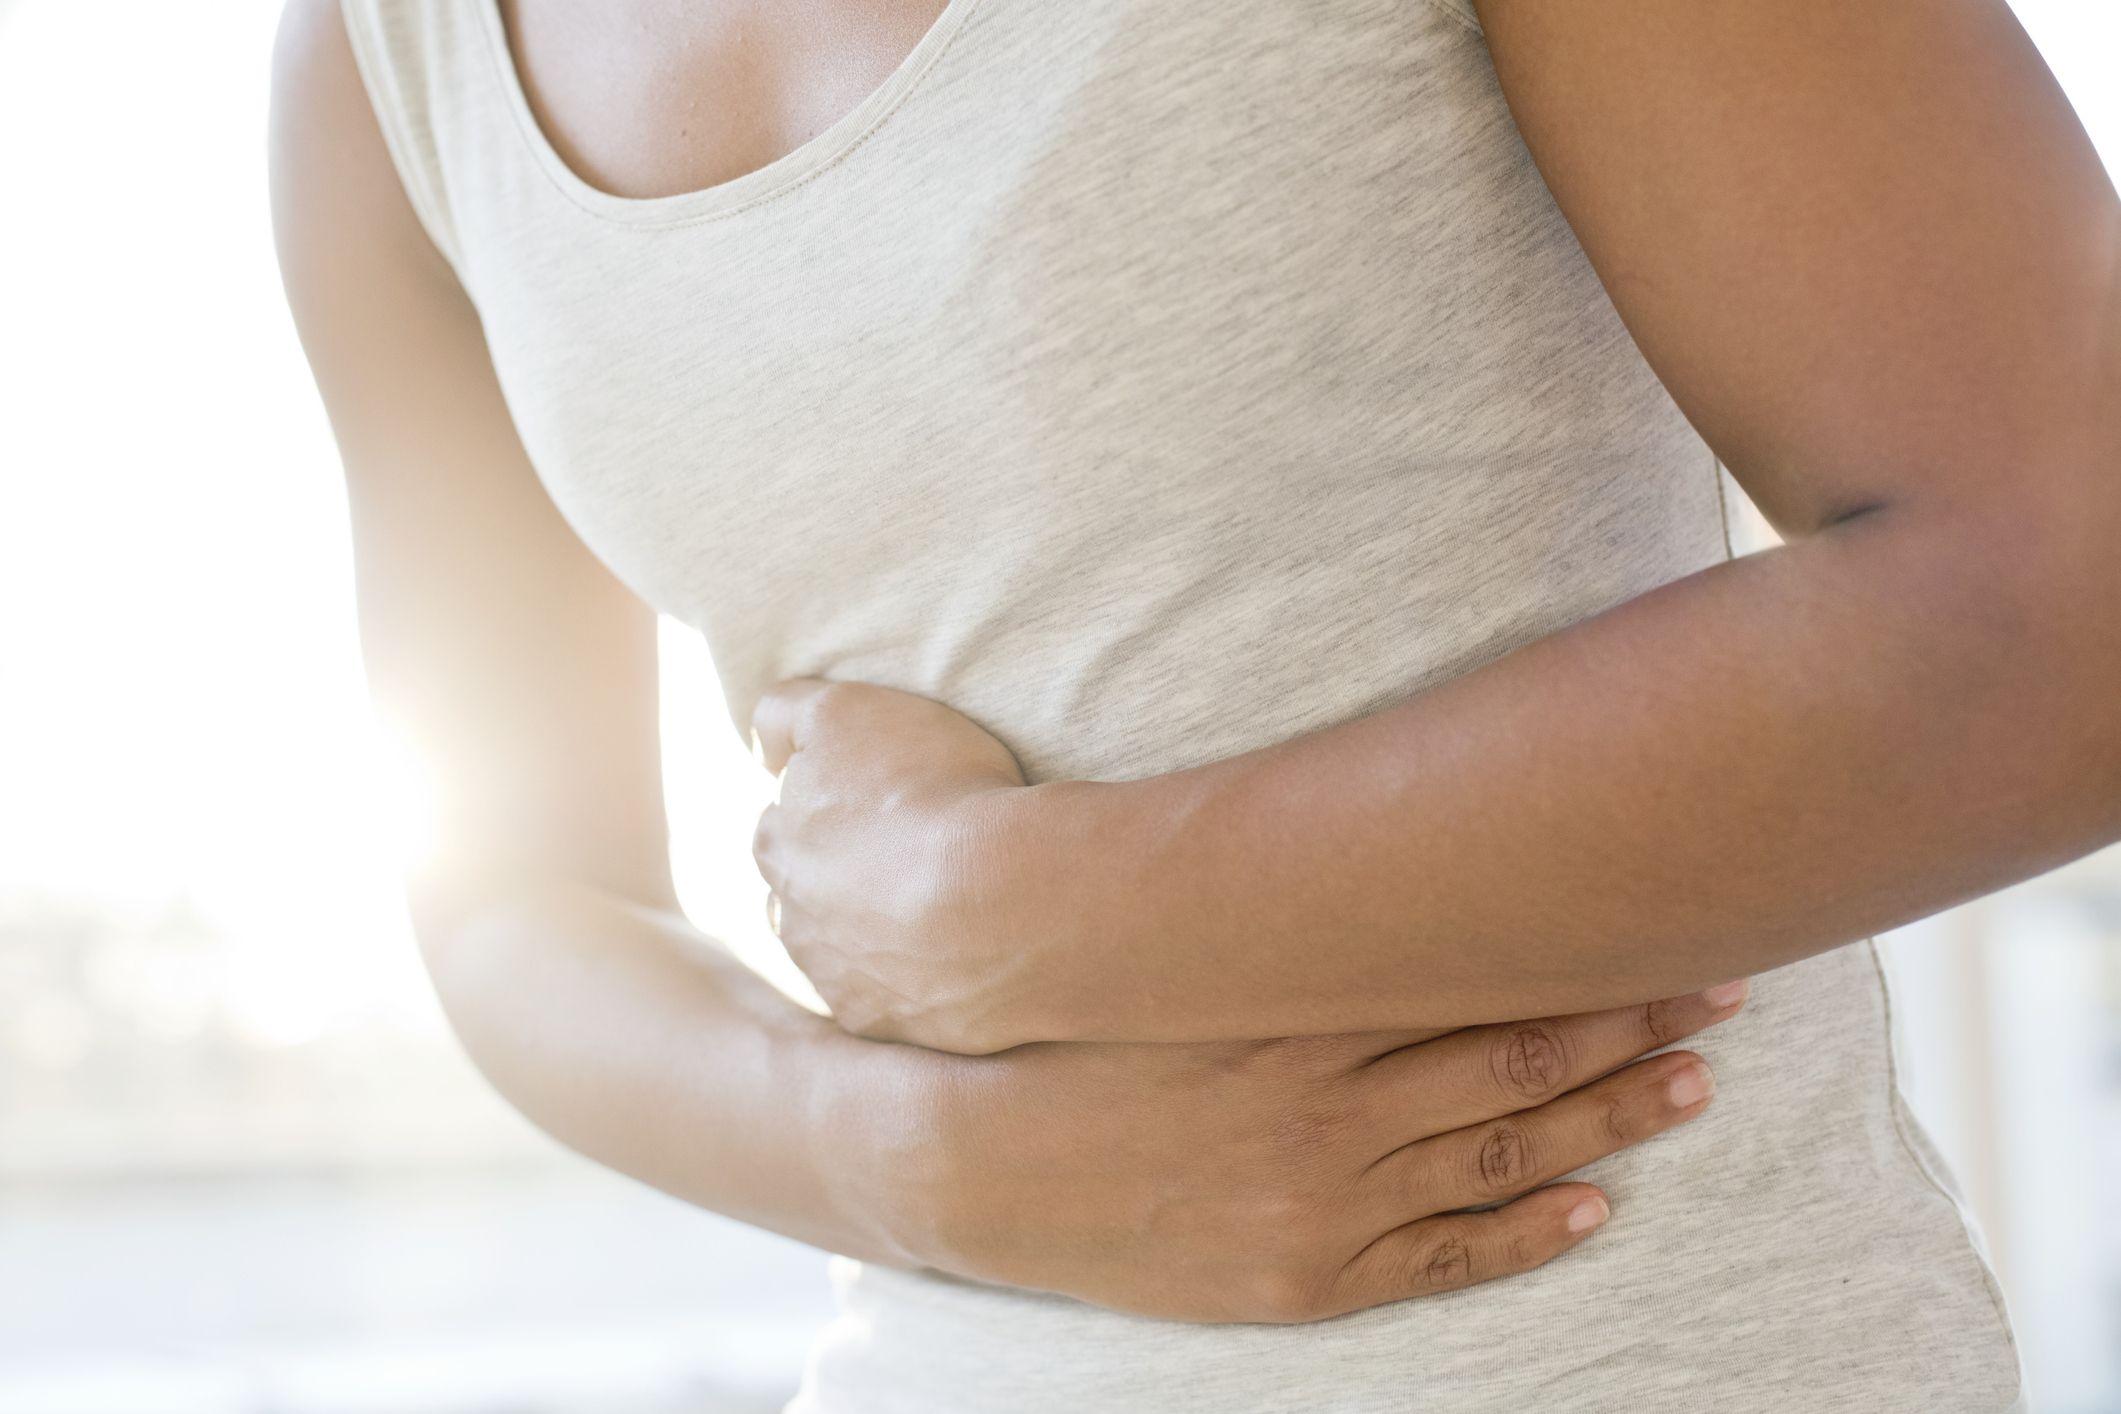 Cancer abdominal pain colon Cancer abdominal pain colon